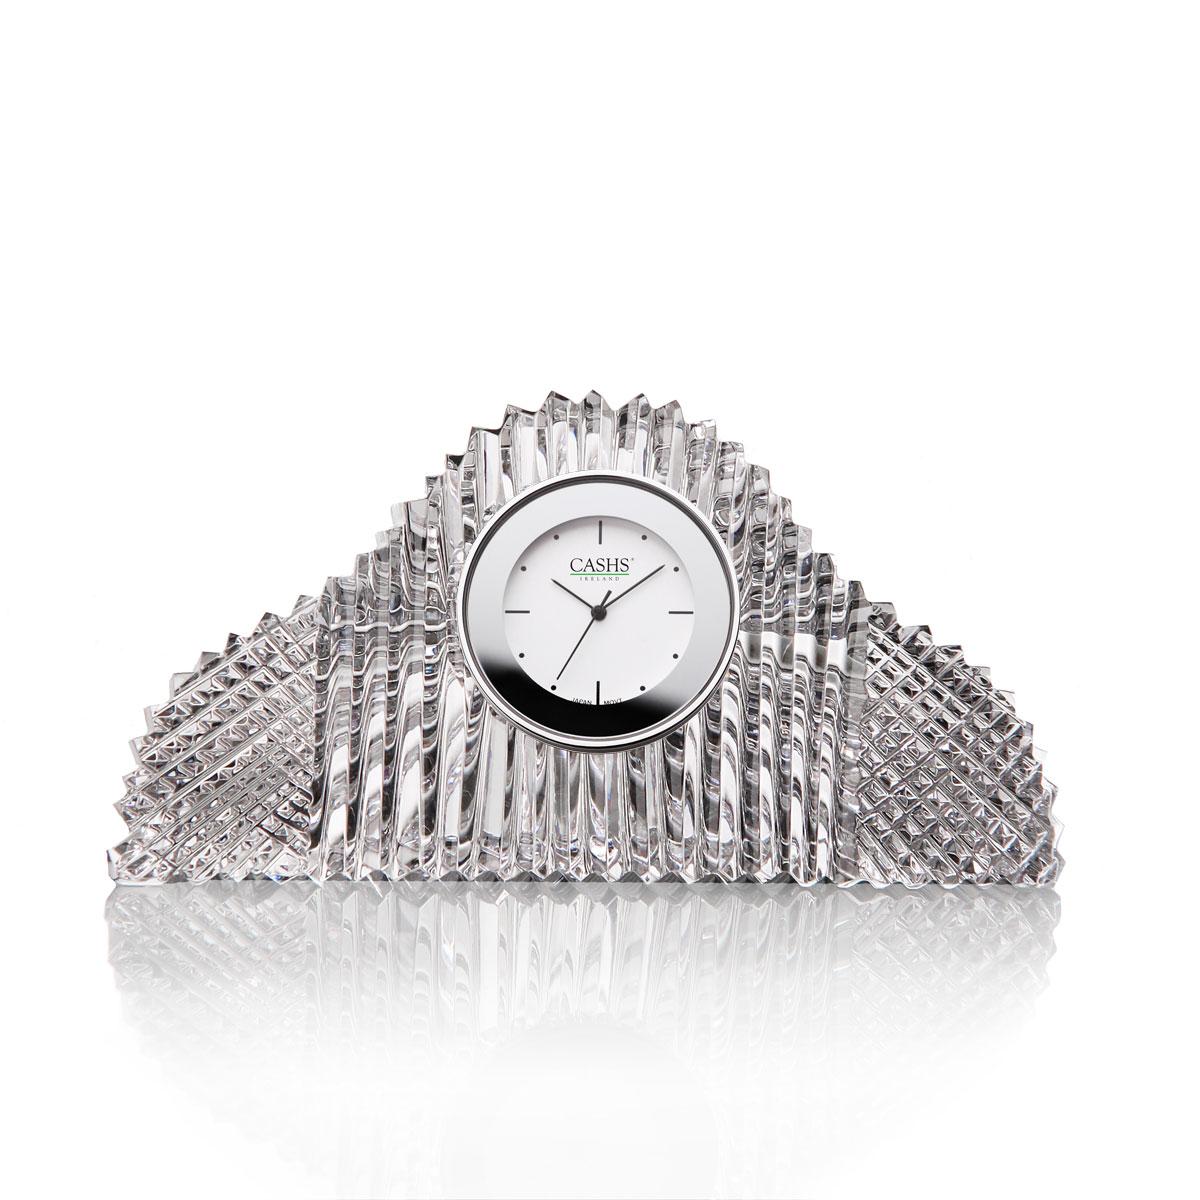 Cashs Ireland, Georgian Mantle Crystal Clock